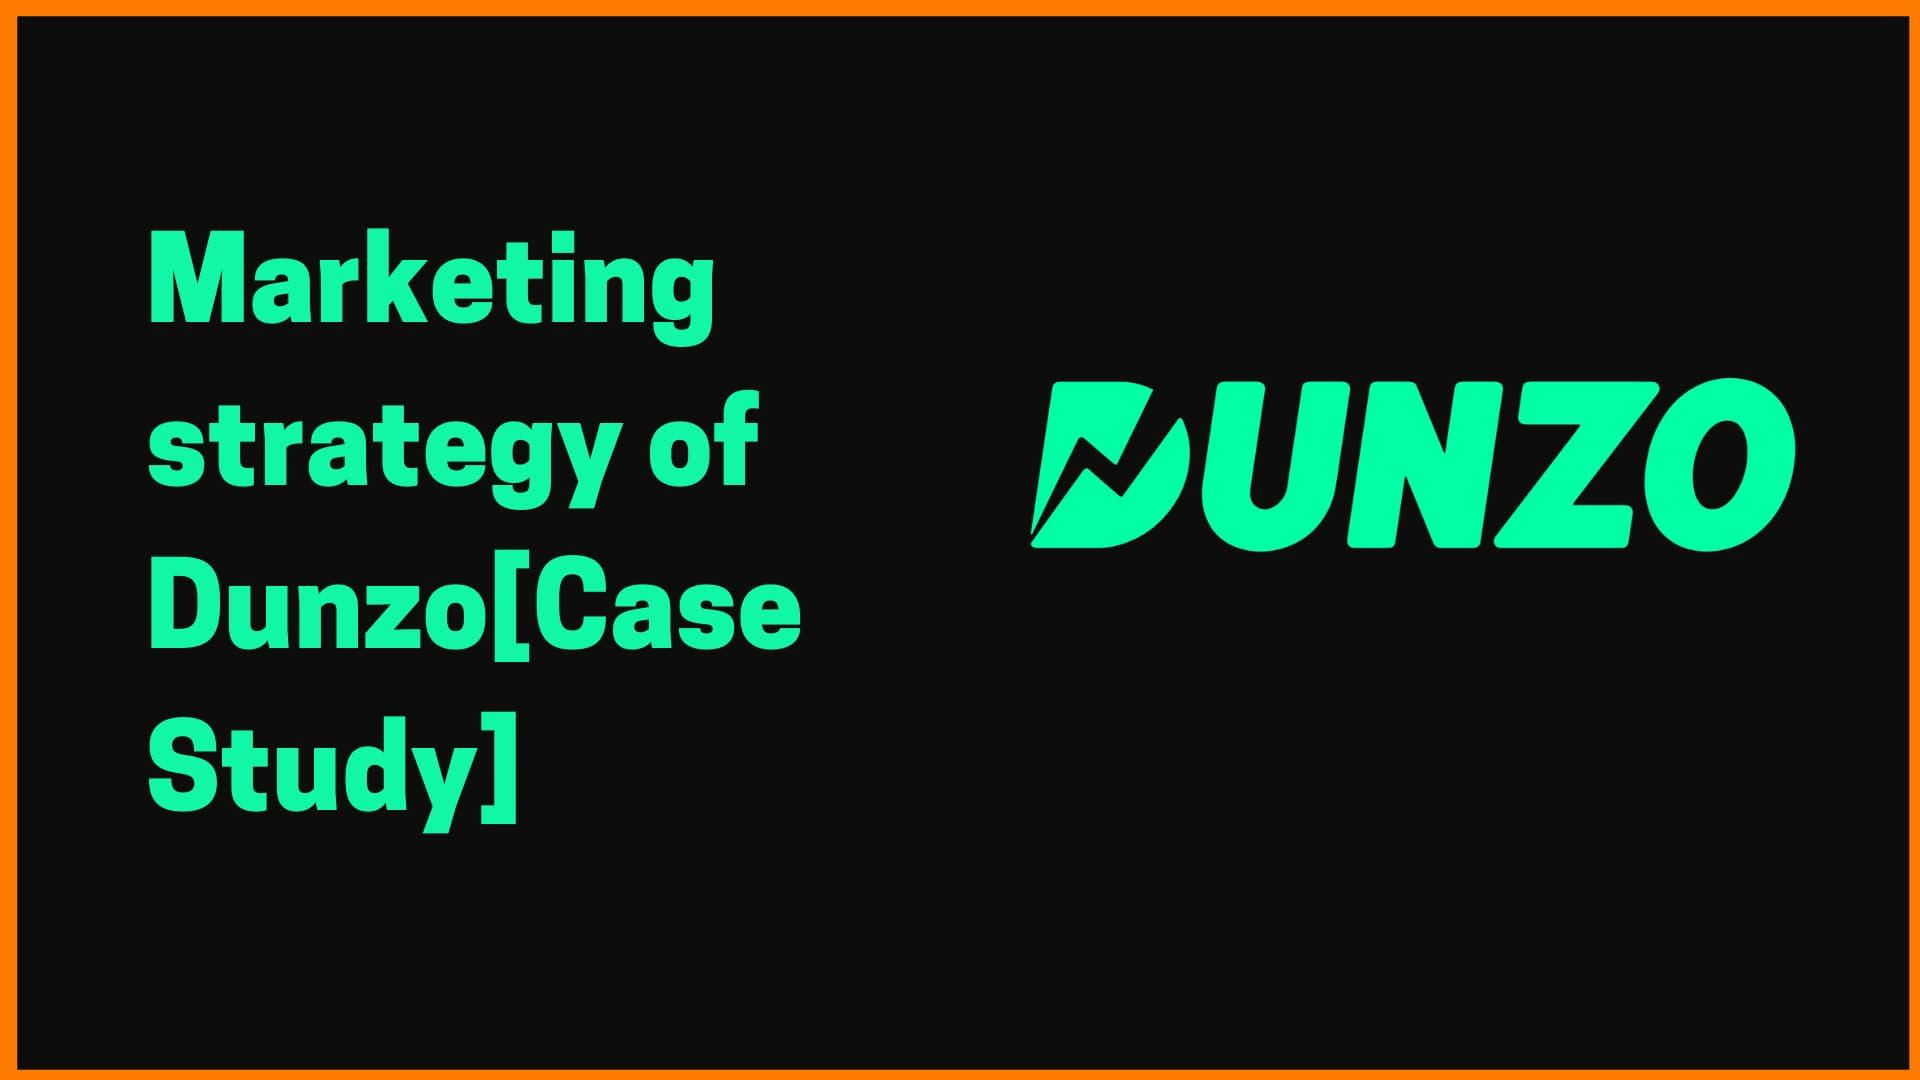 Marketing Strategies of Dunzo [Case Study]